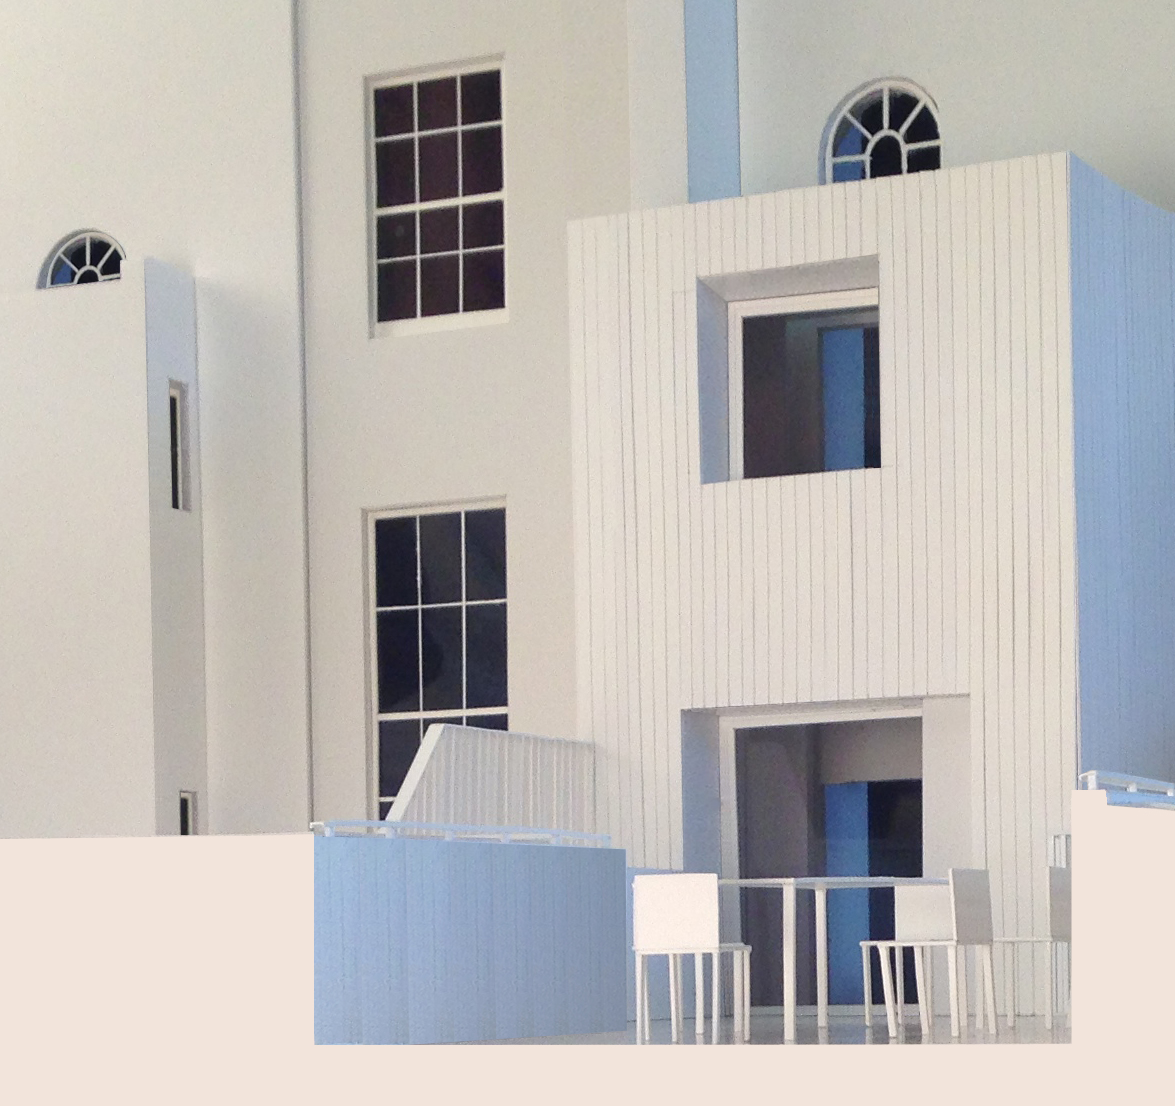 enerphit passivhaus prewett bizley architects.jpg